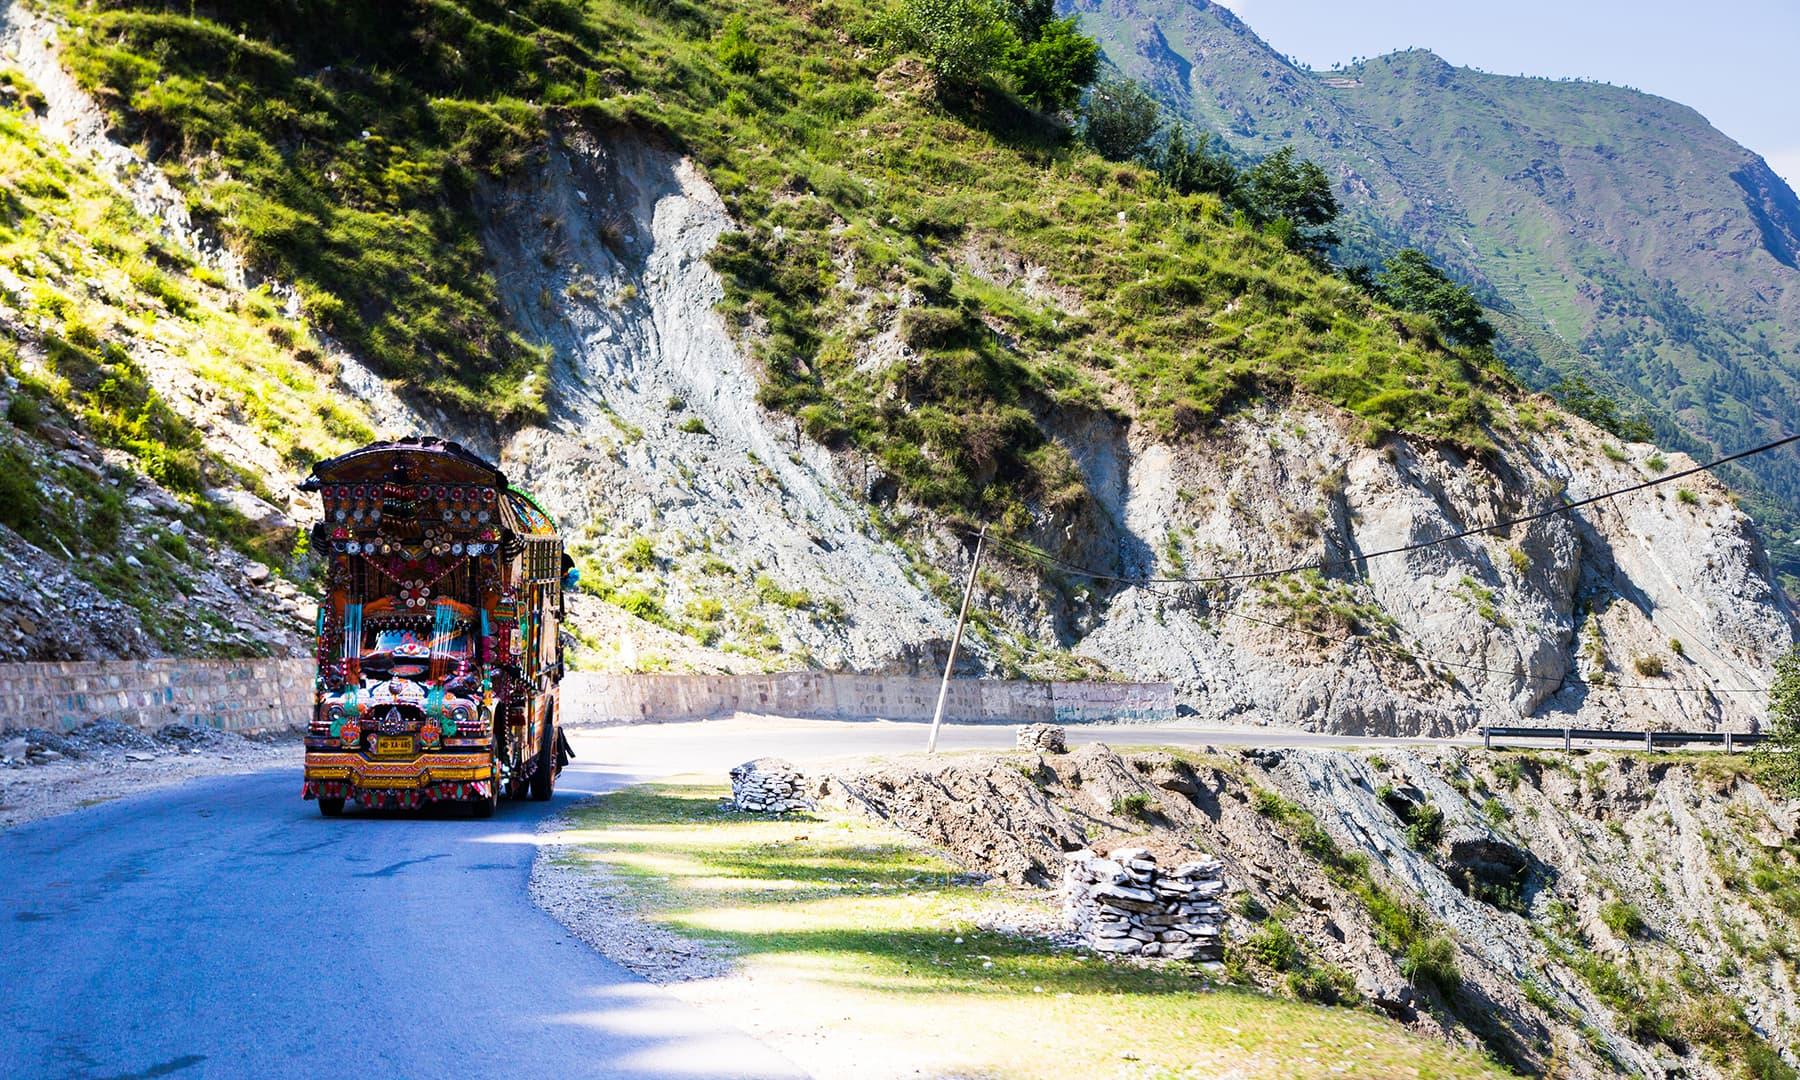 En Route Keran. —Marvi Soomro